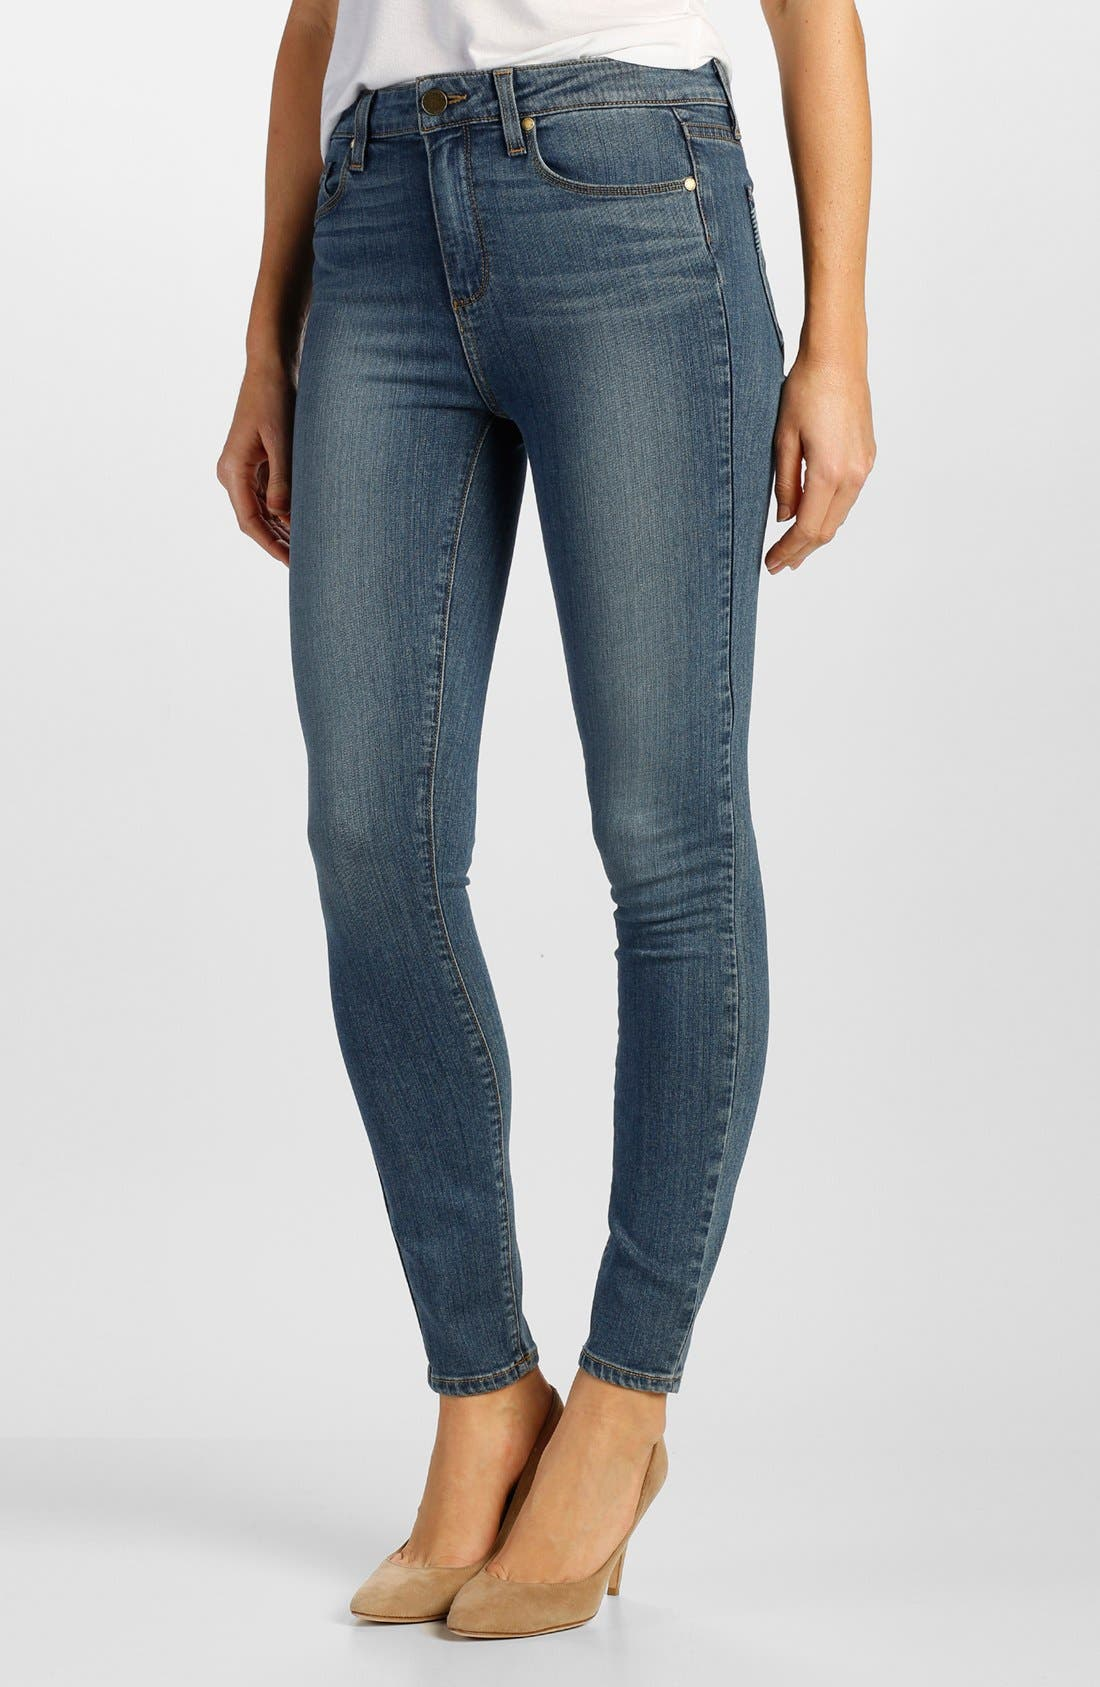 Alternate Image 1 Selected - Paige Denim 'Transcend - Hoxton' High Rise Ankle Skinny Jeans (Brett)